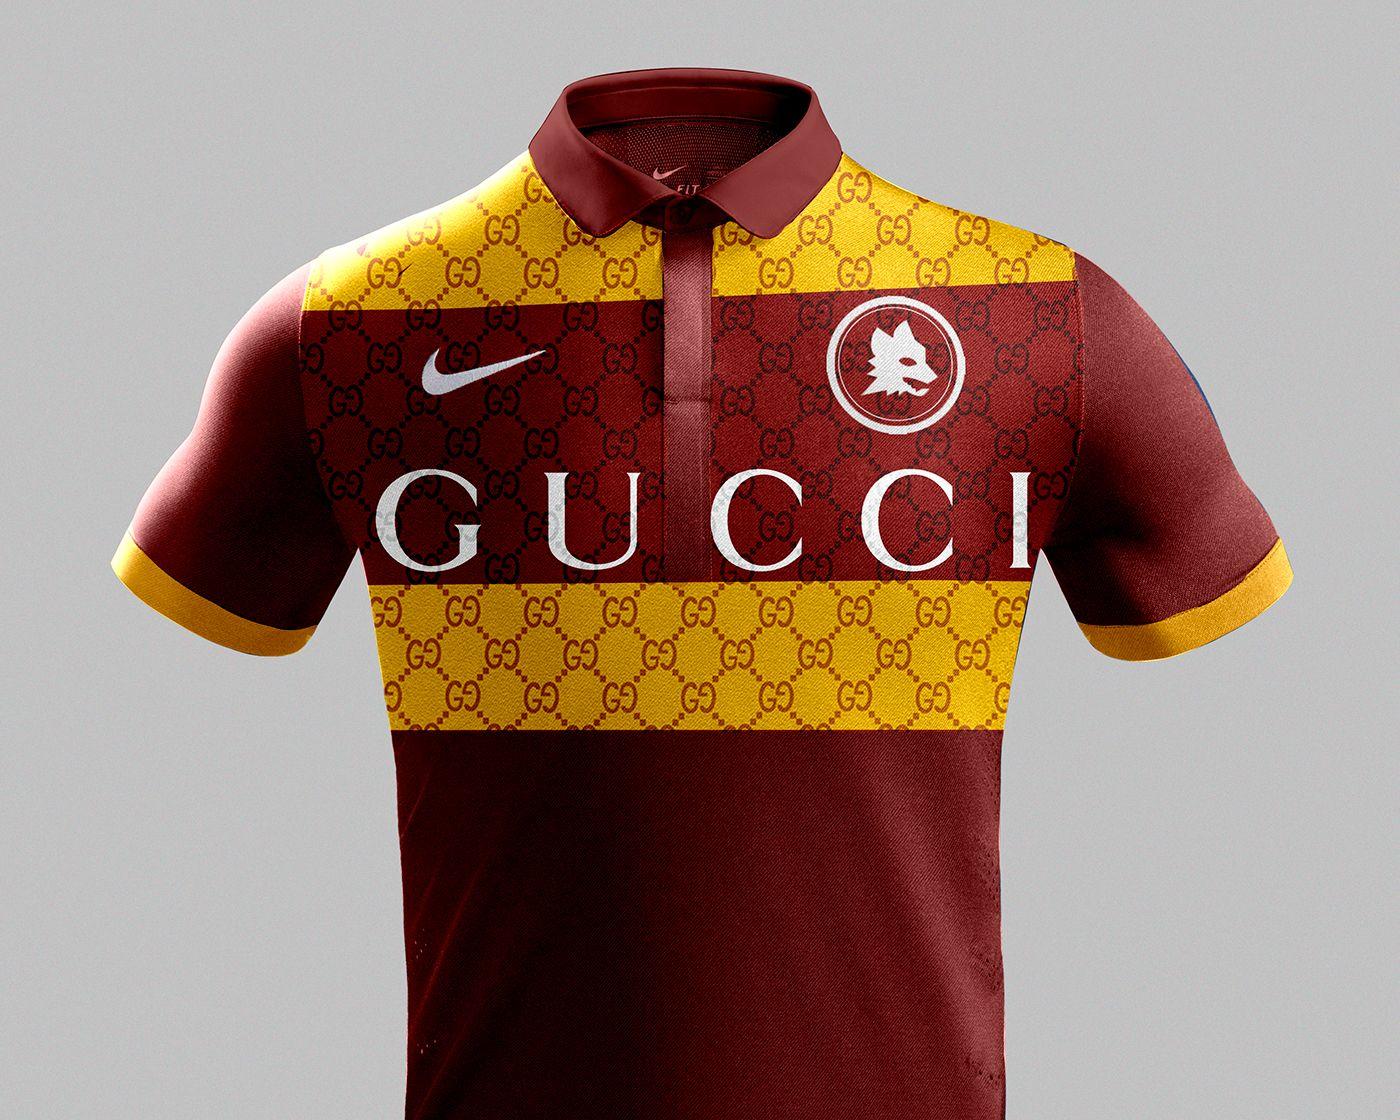 65b94af61 Luxury Brand Football Kits on Behance | polo | Football kits, Sports ...